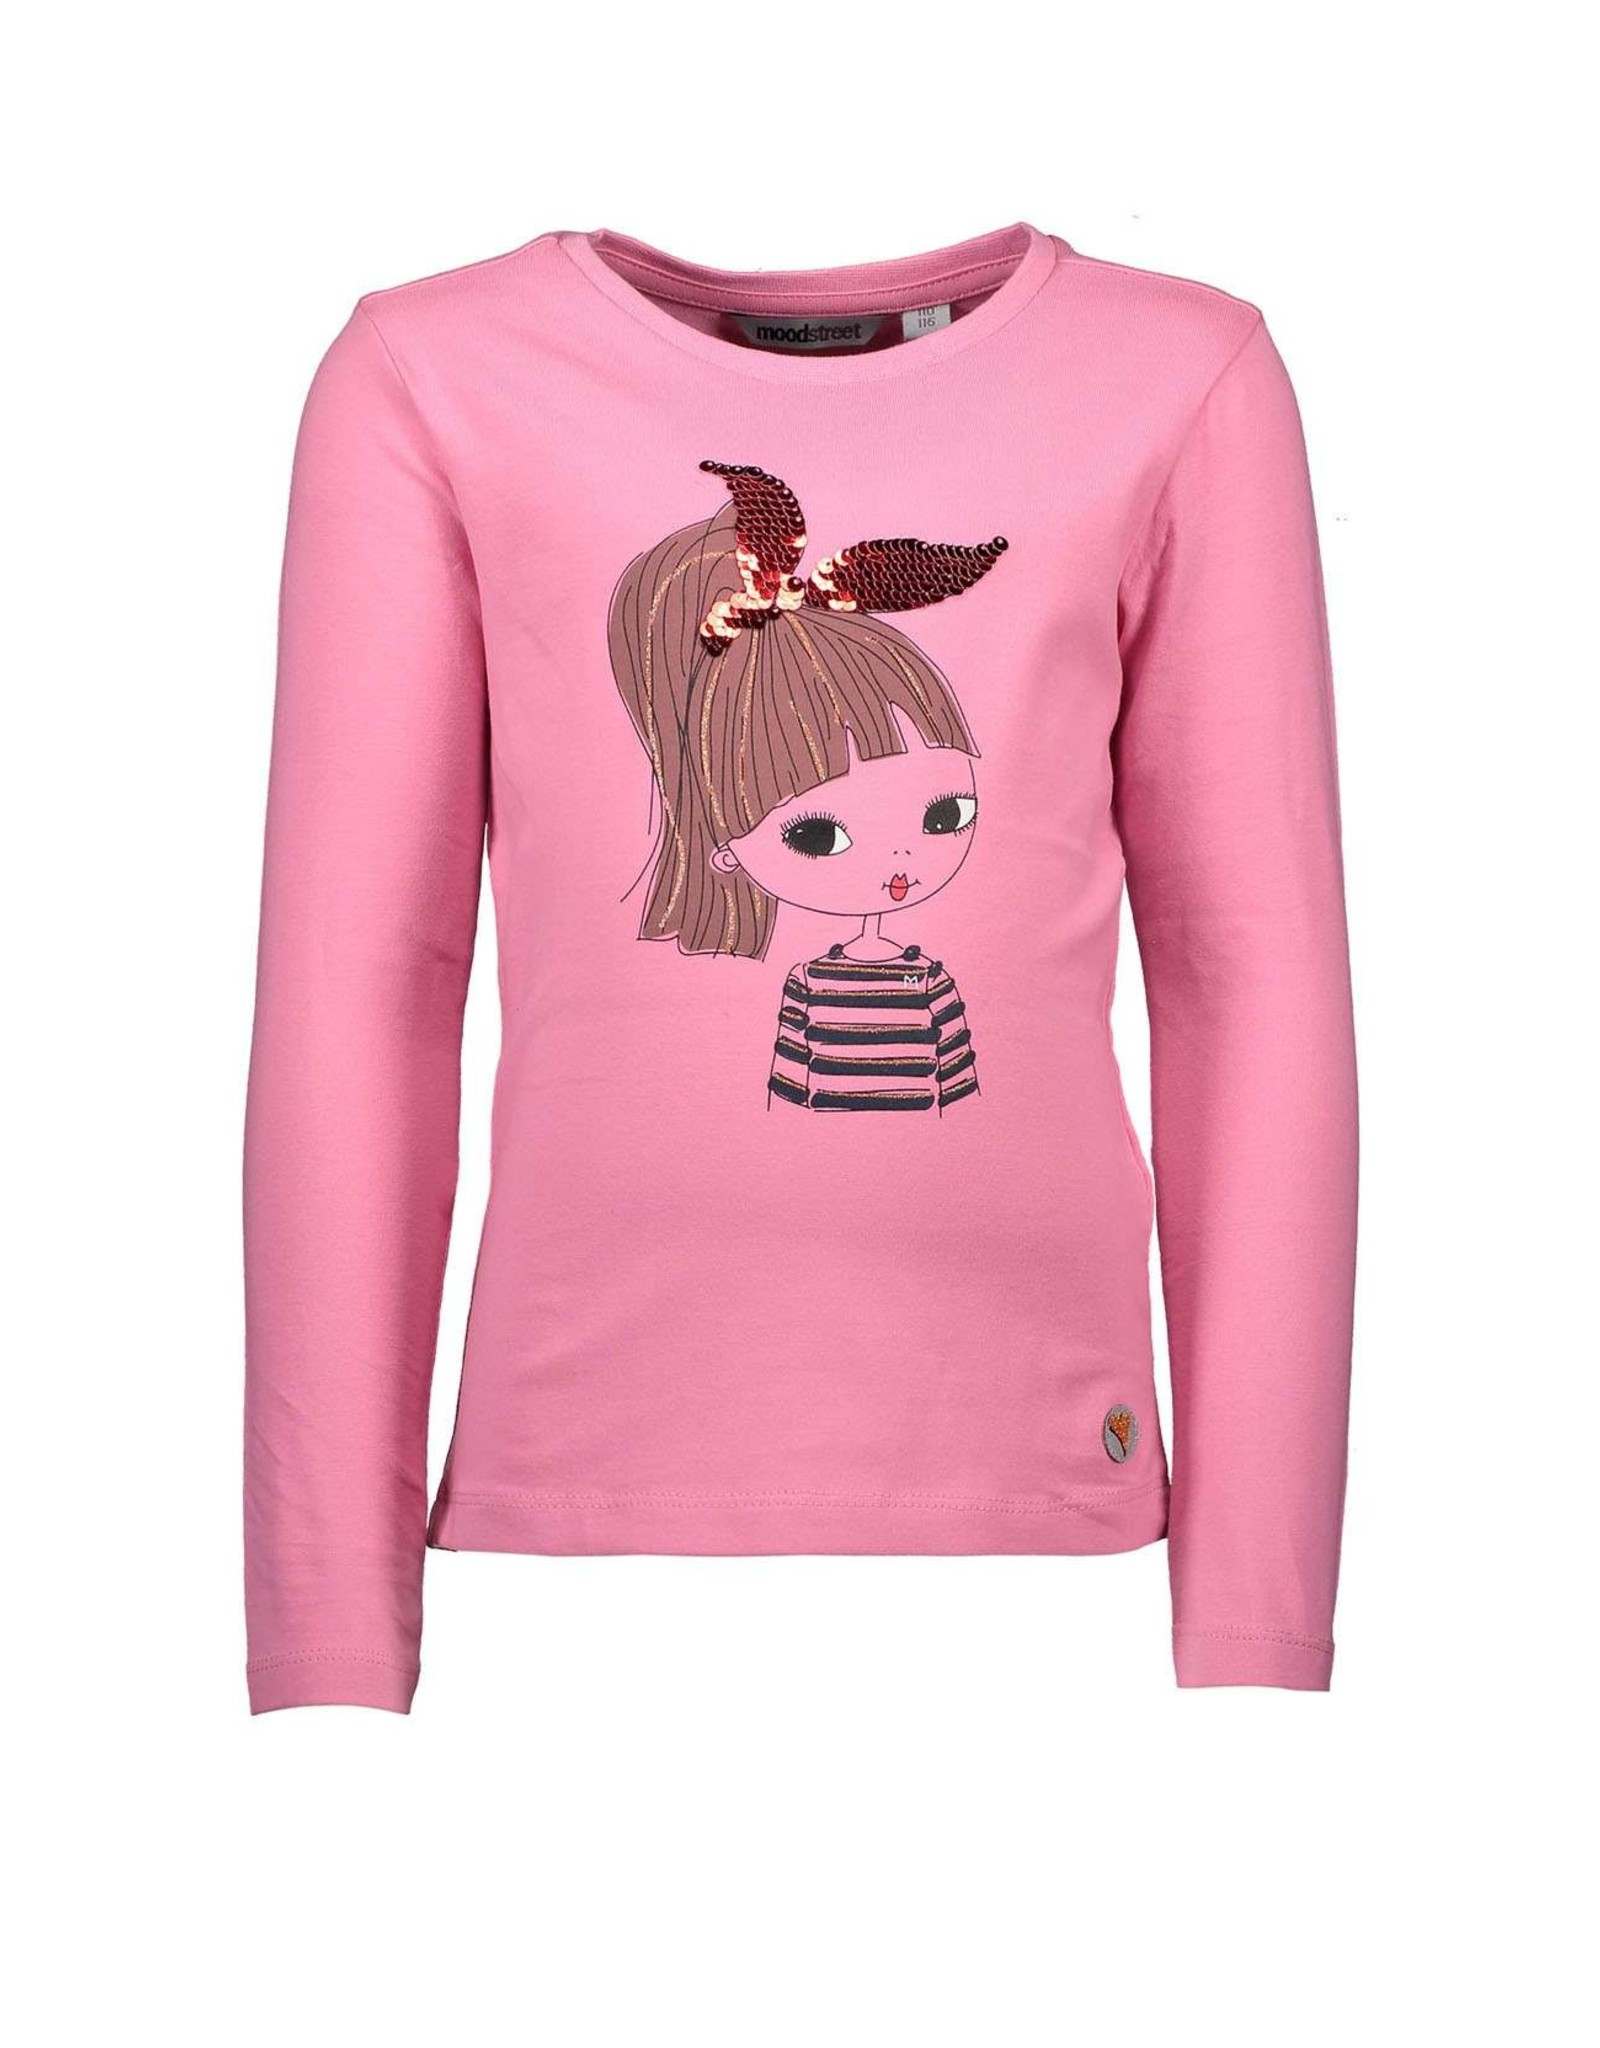 Moodstreet Moodstreet-MT T-Shirt Applique And Sequins-Soft Pink